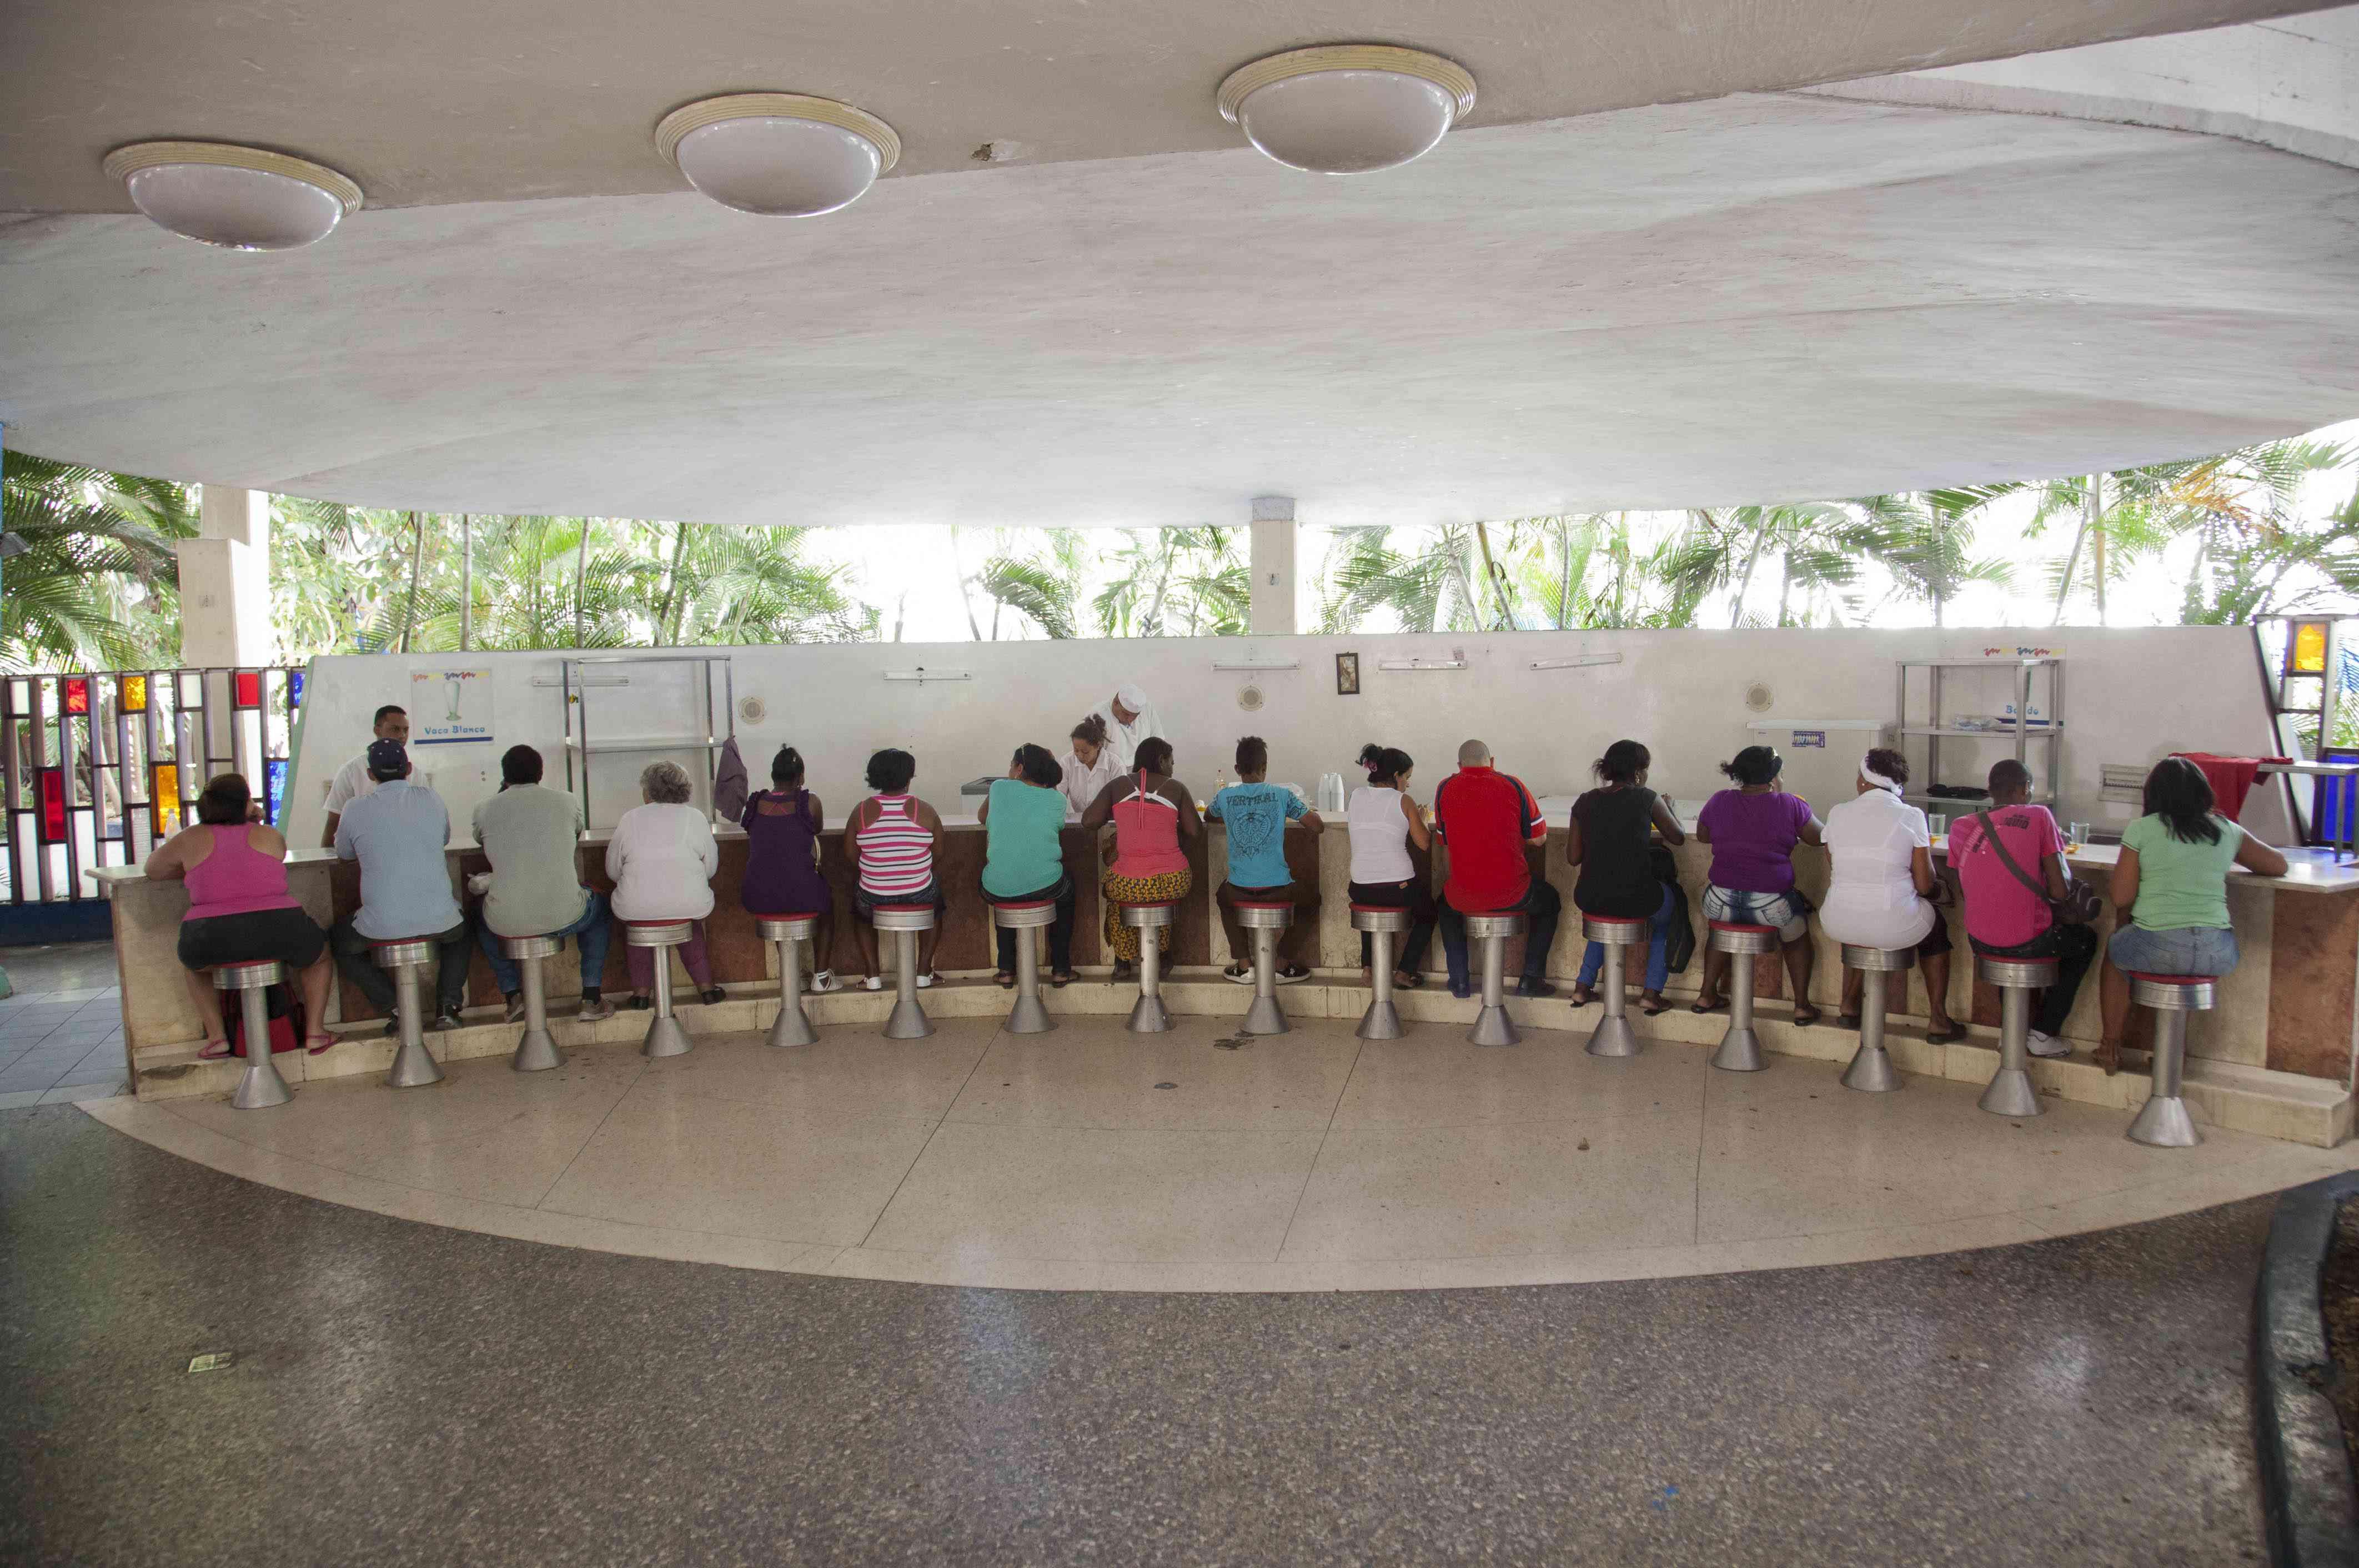 Cuba - Travel - Havana at work and play